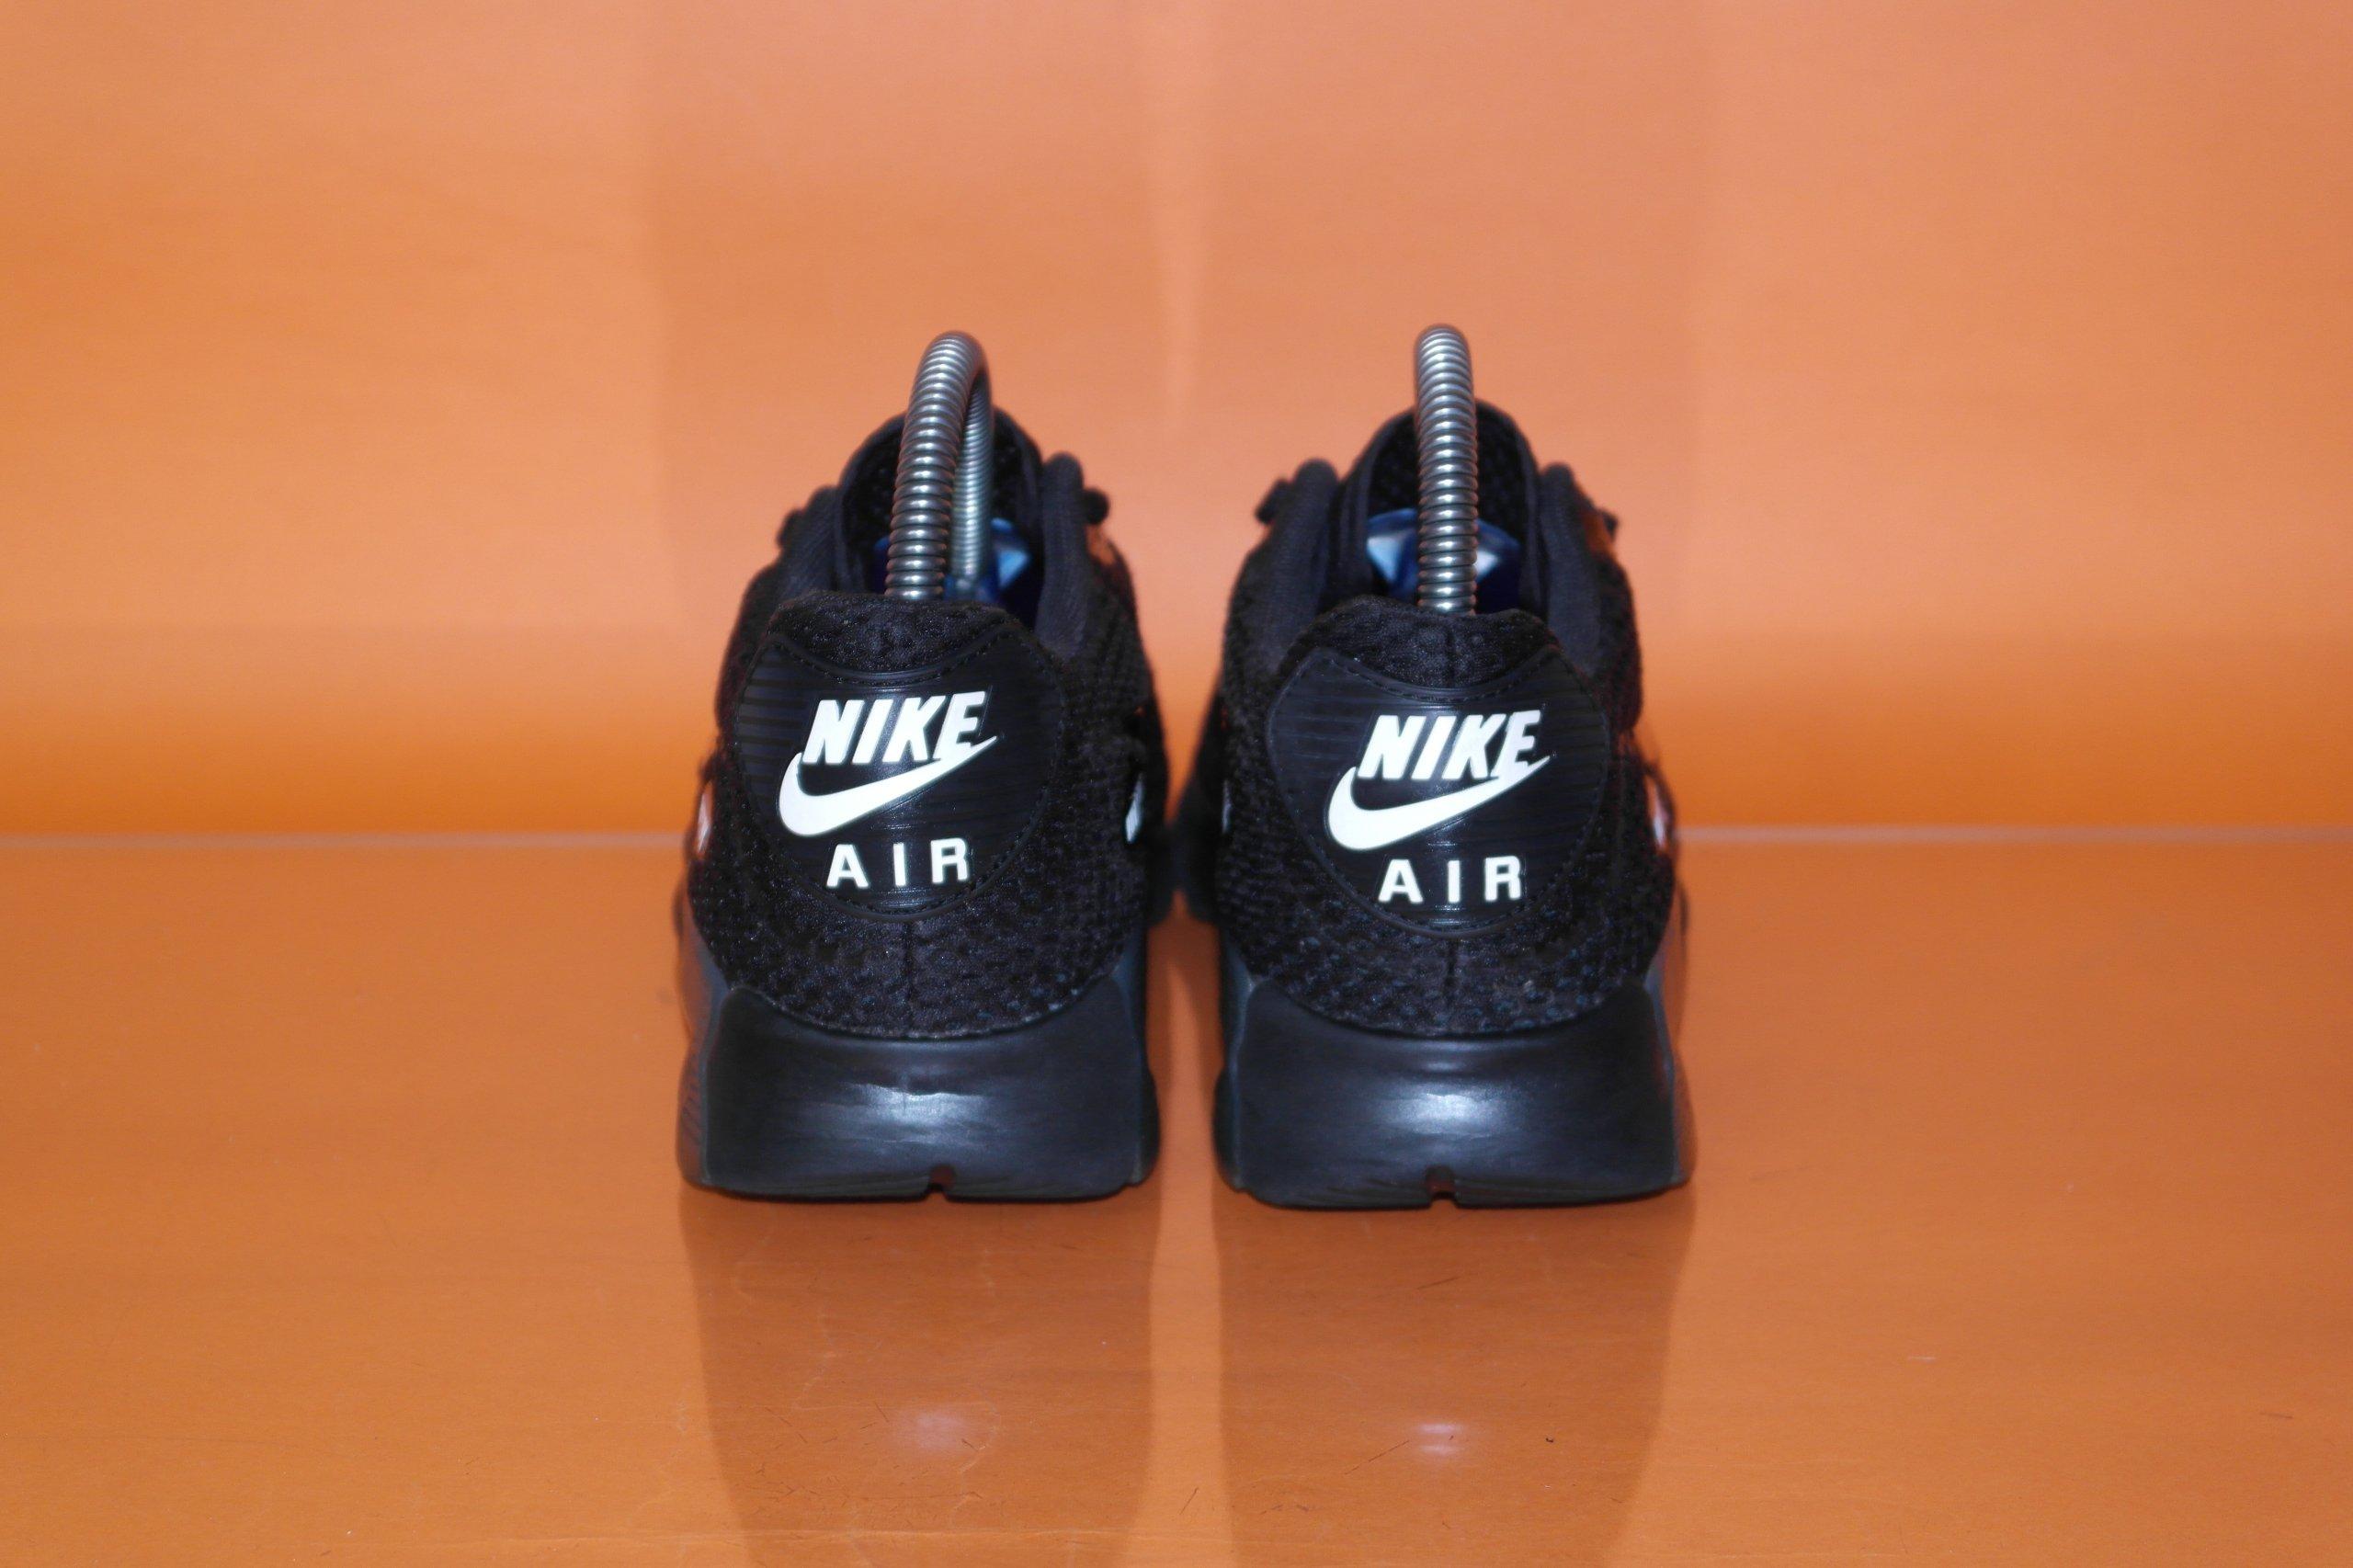 NIKE AIR MAX 90 Ultra BR buty sportowe r.38,5 7380270348